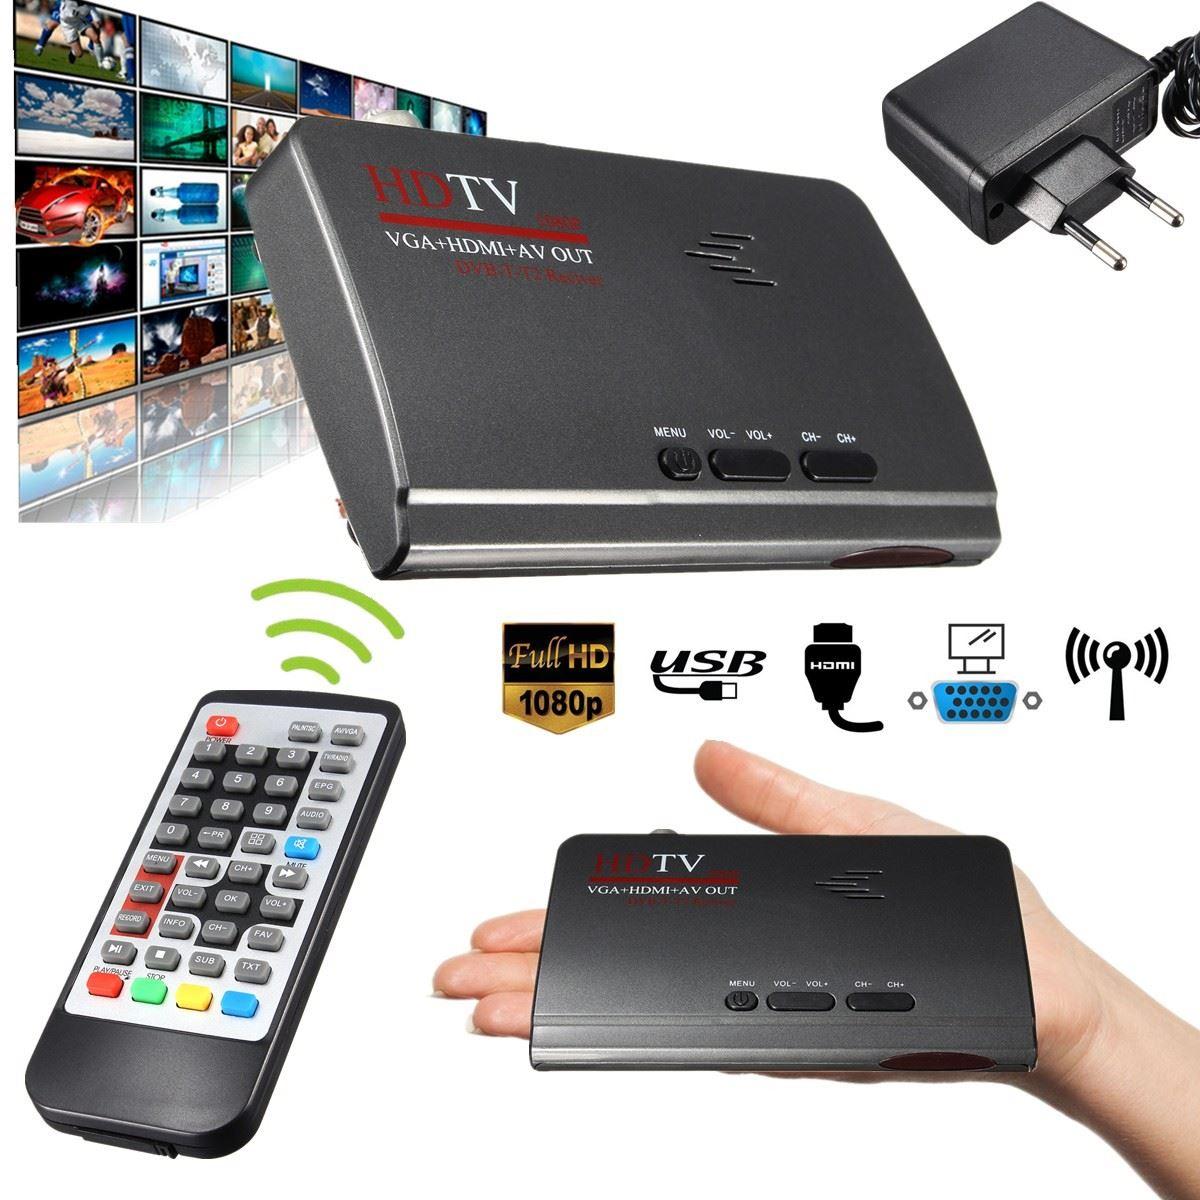 1080P Full HD HDMI DVB-T T2 TV Box VGA/AV Tuner Receiver Converter With Remote Control(China (Mainland))